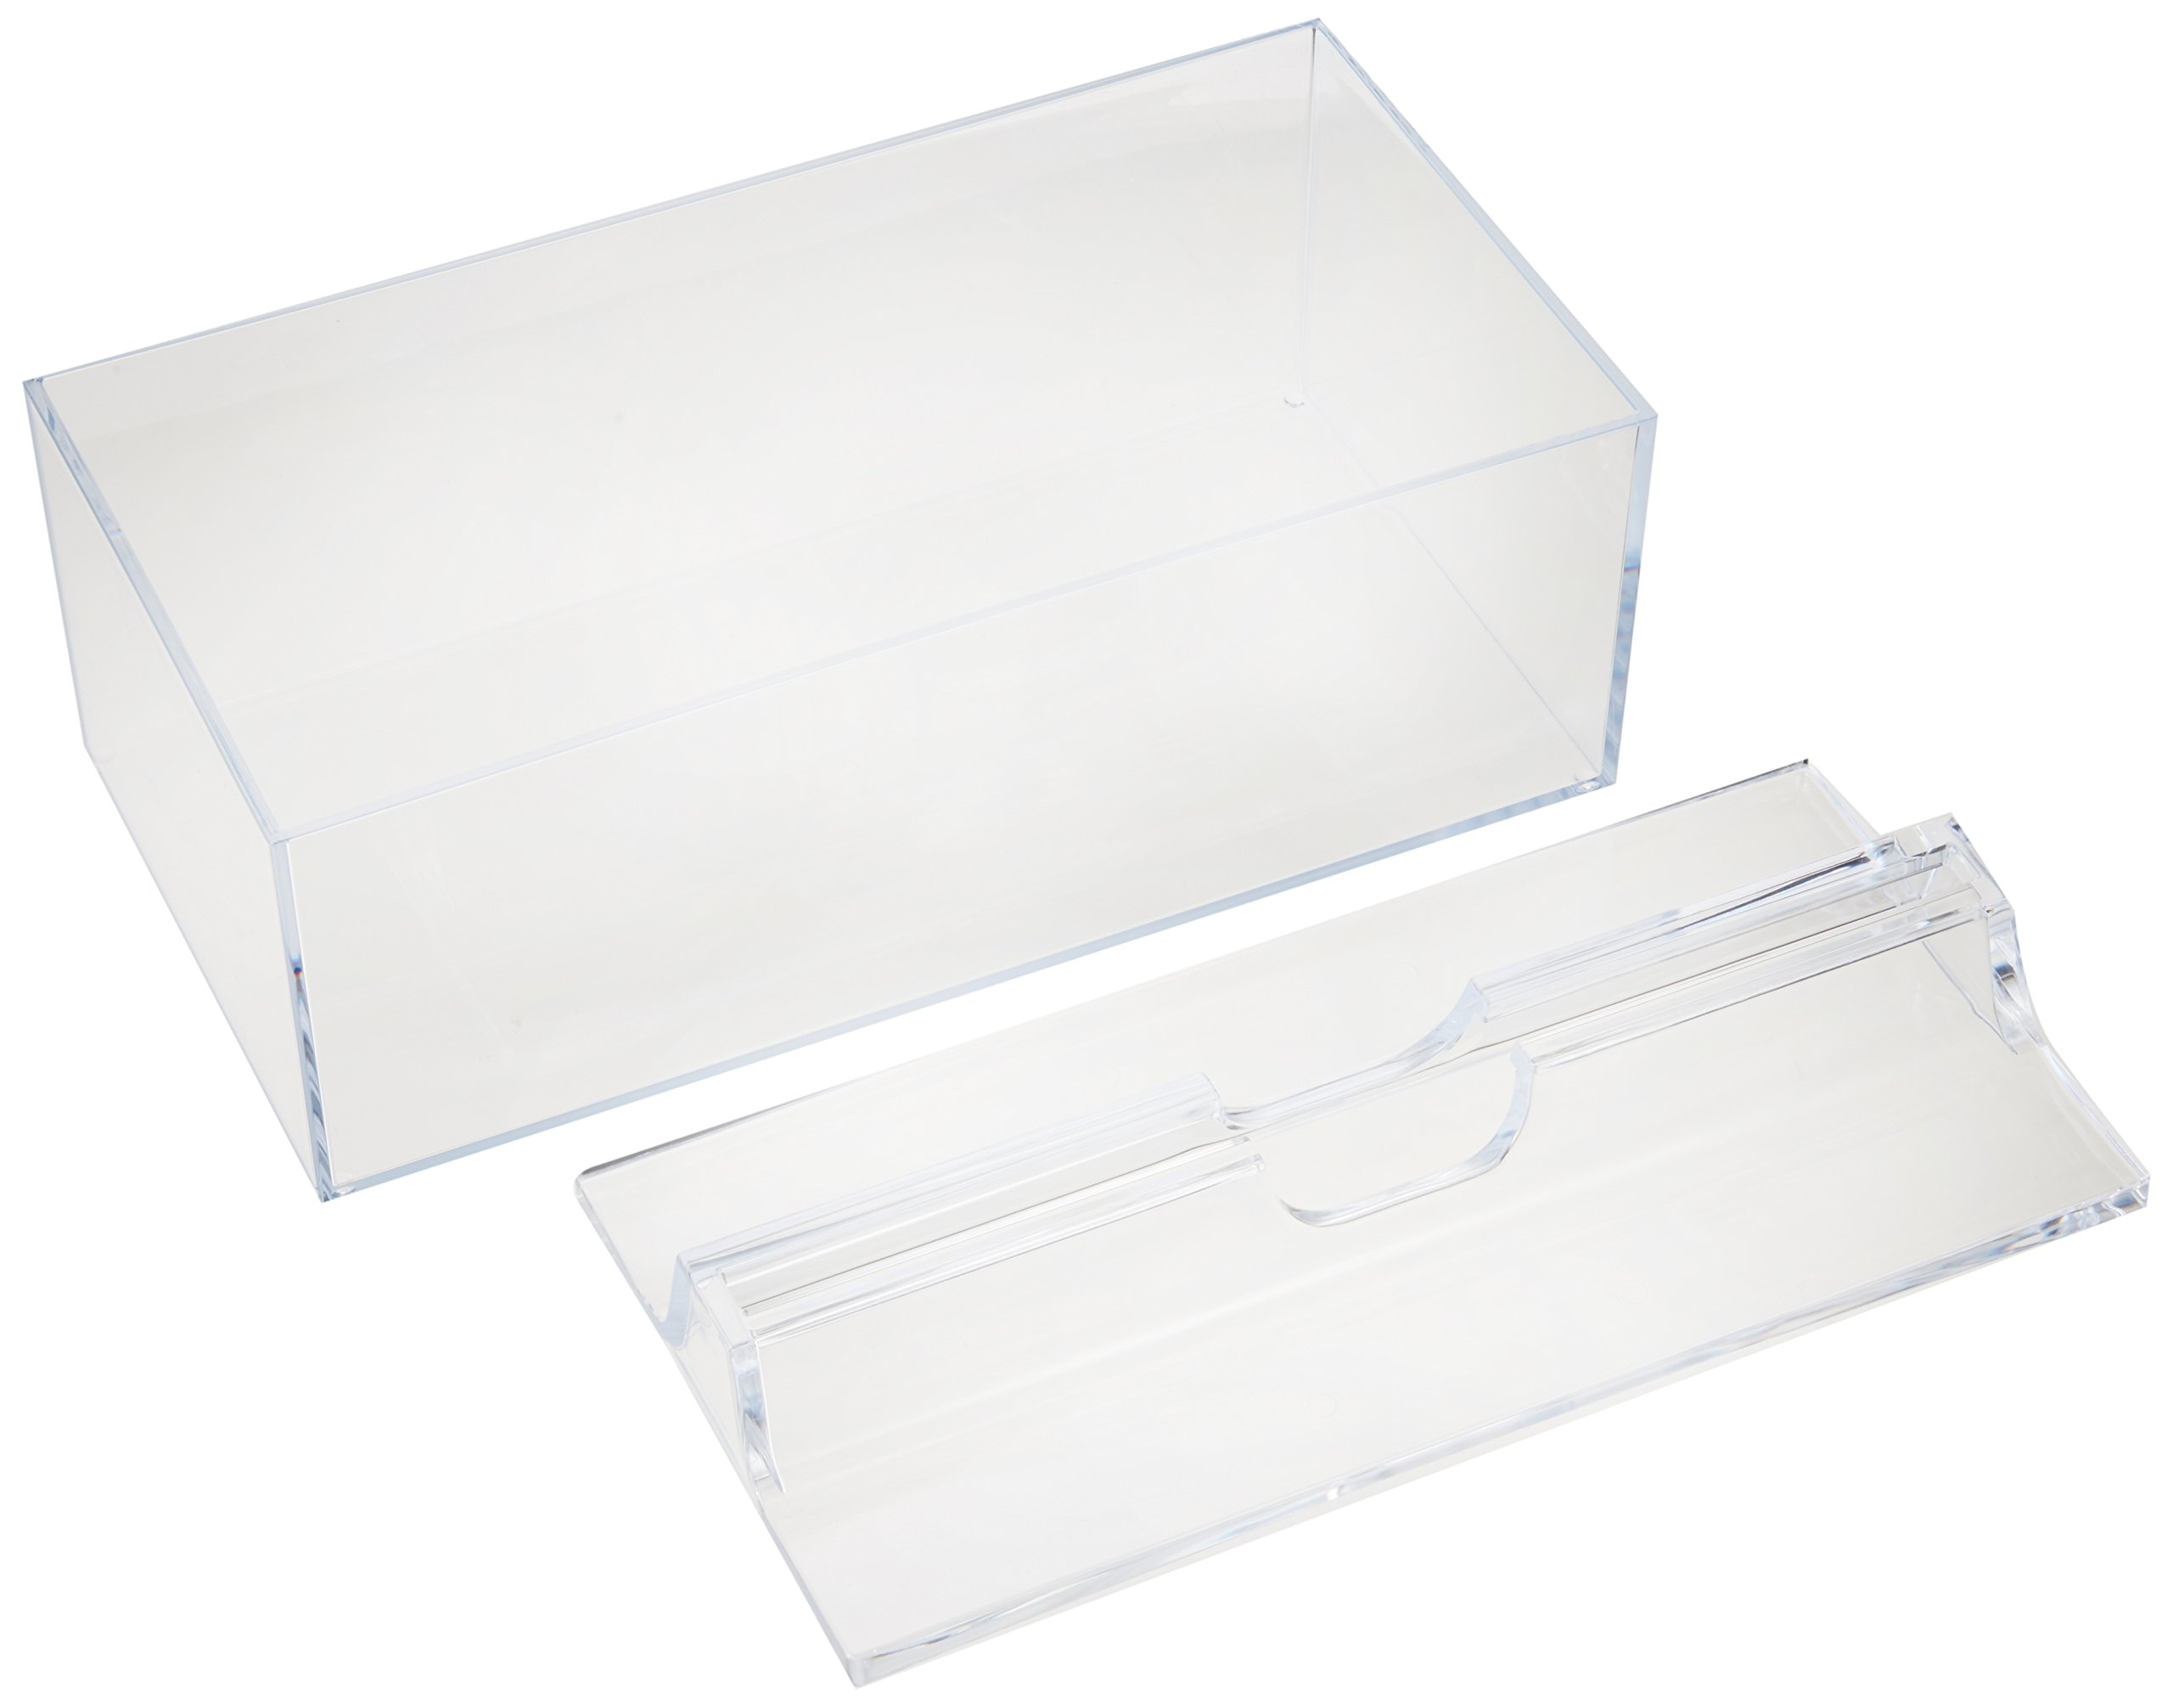 Butterfly Plastic Industrial Paper Towel Case by Butterfly plastic industry